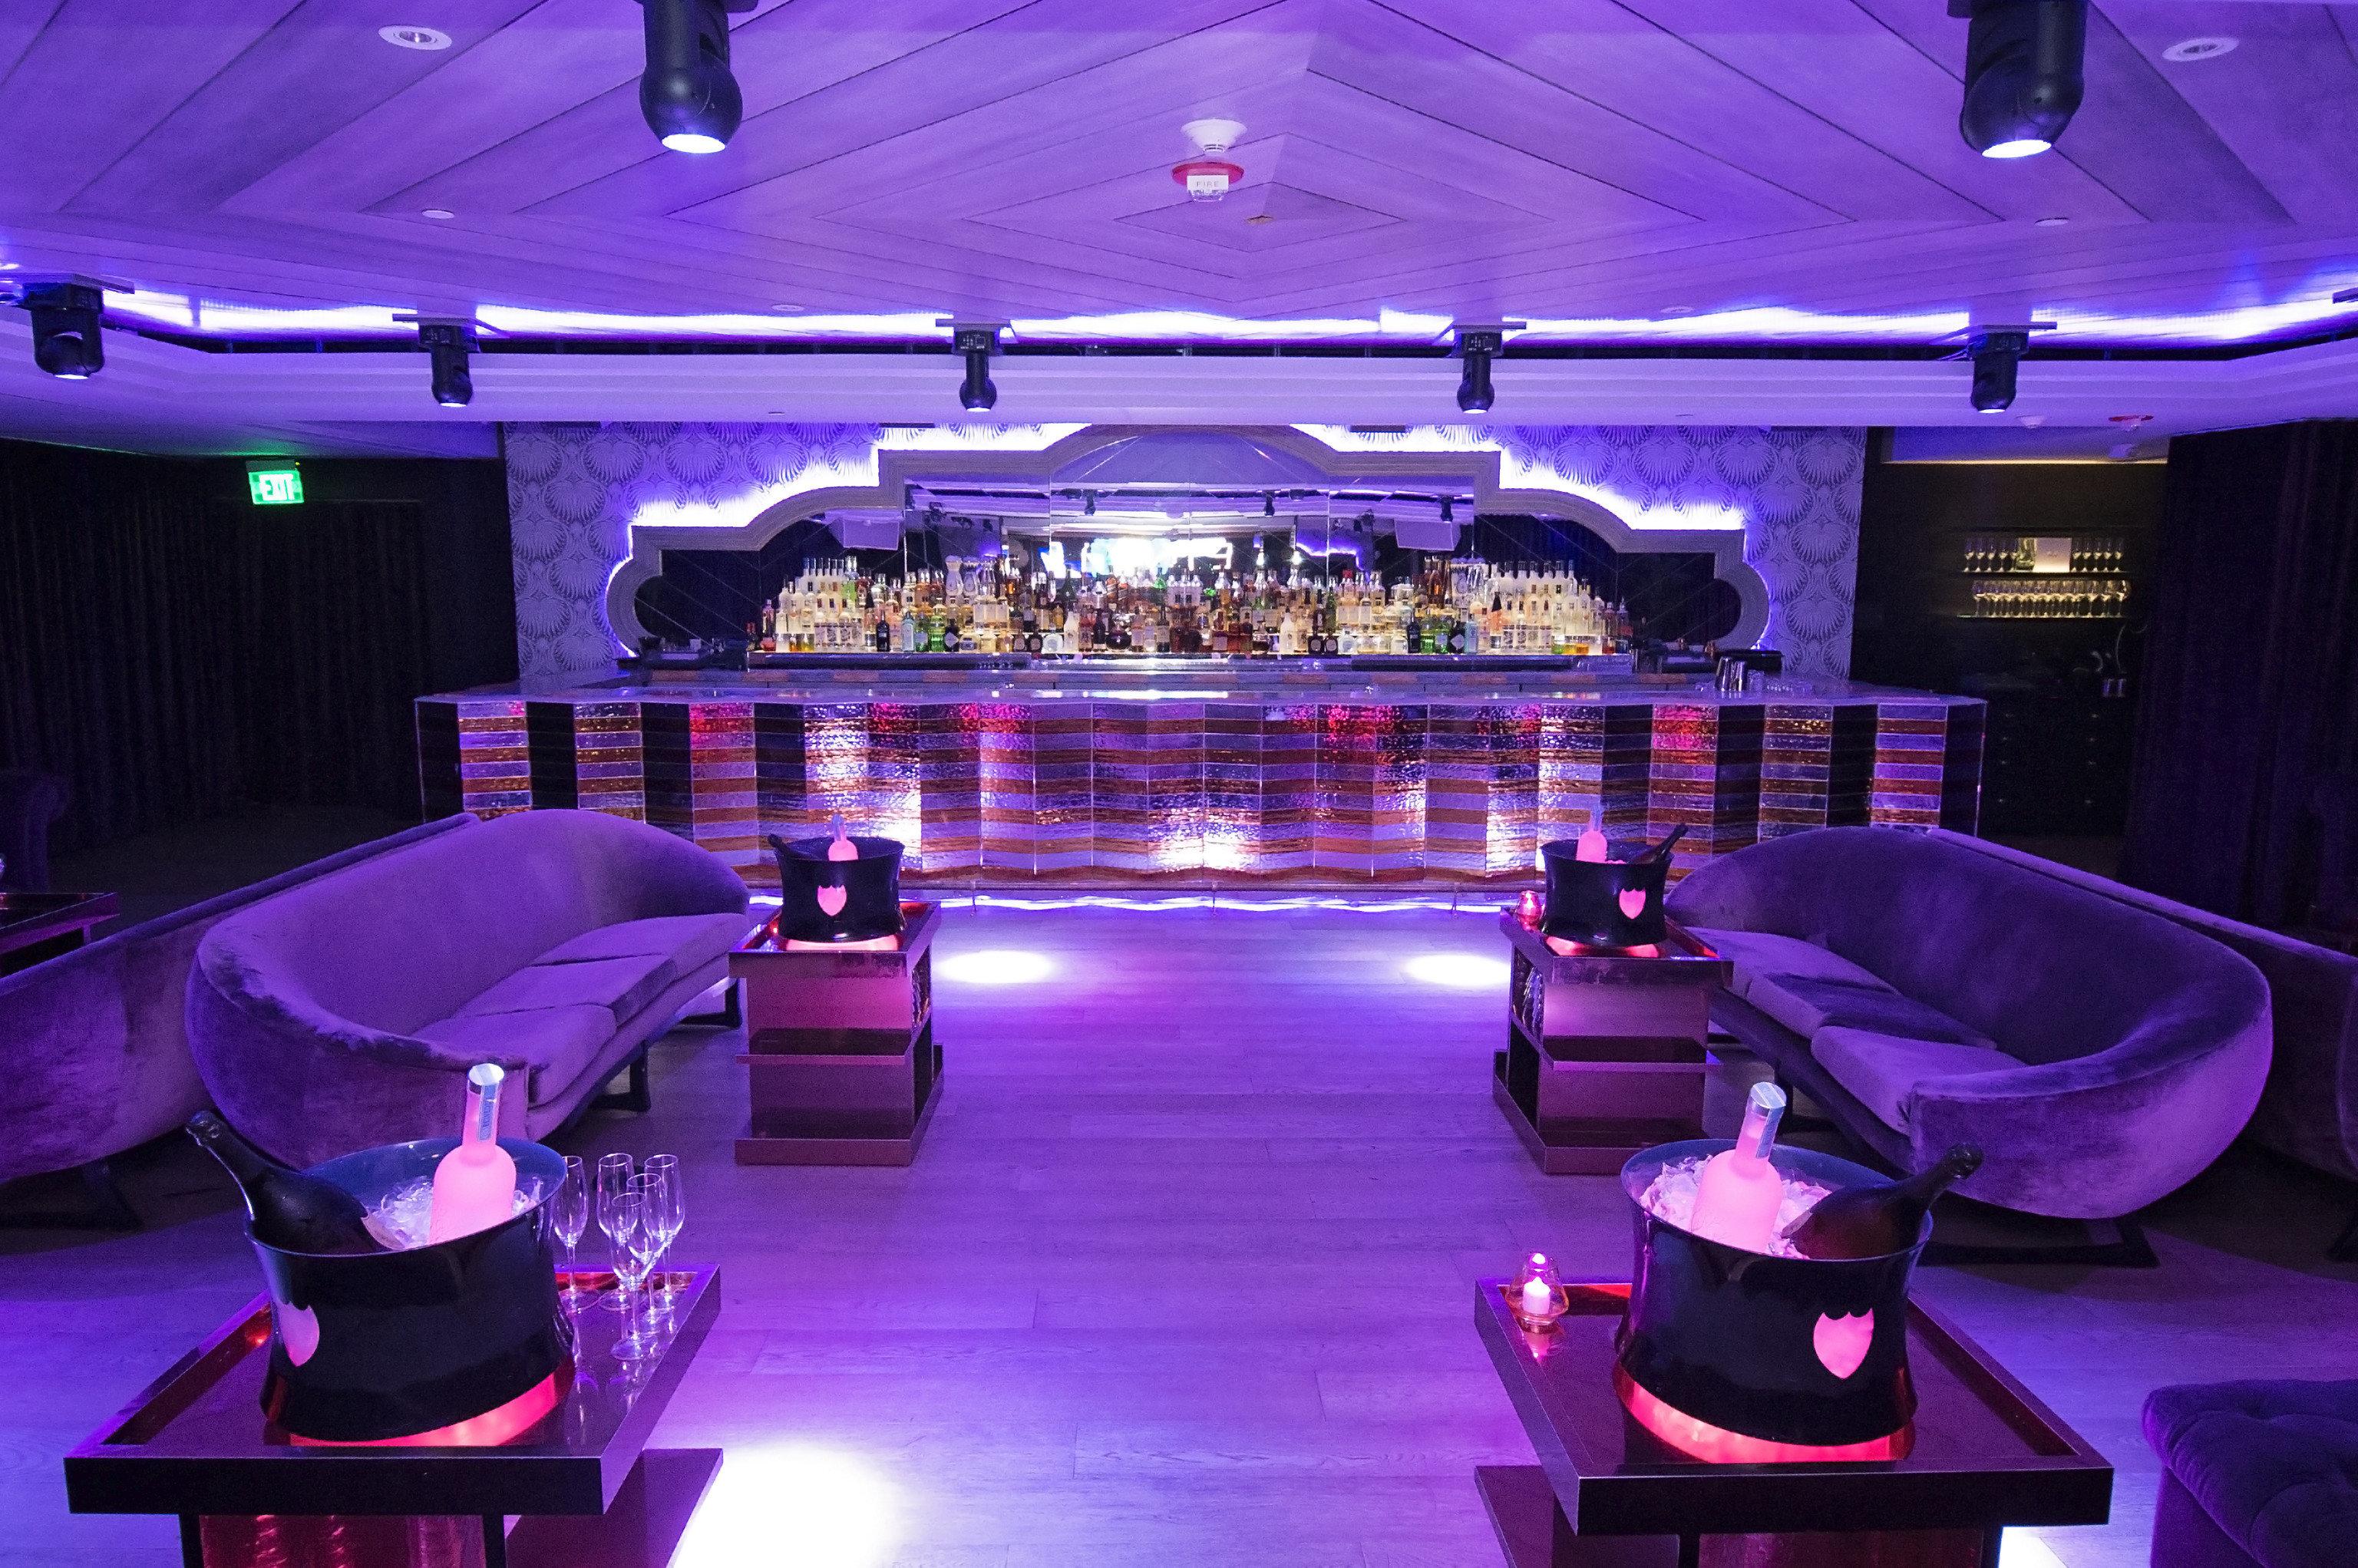 Trip Ideas indoor floor room ceiling Living nightclub function hall stage lighting Bar interior design purple convention center furniture